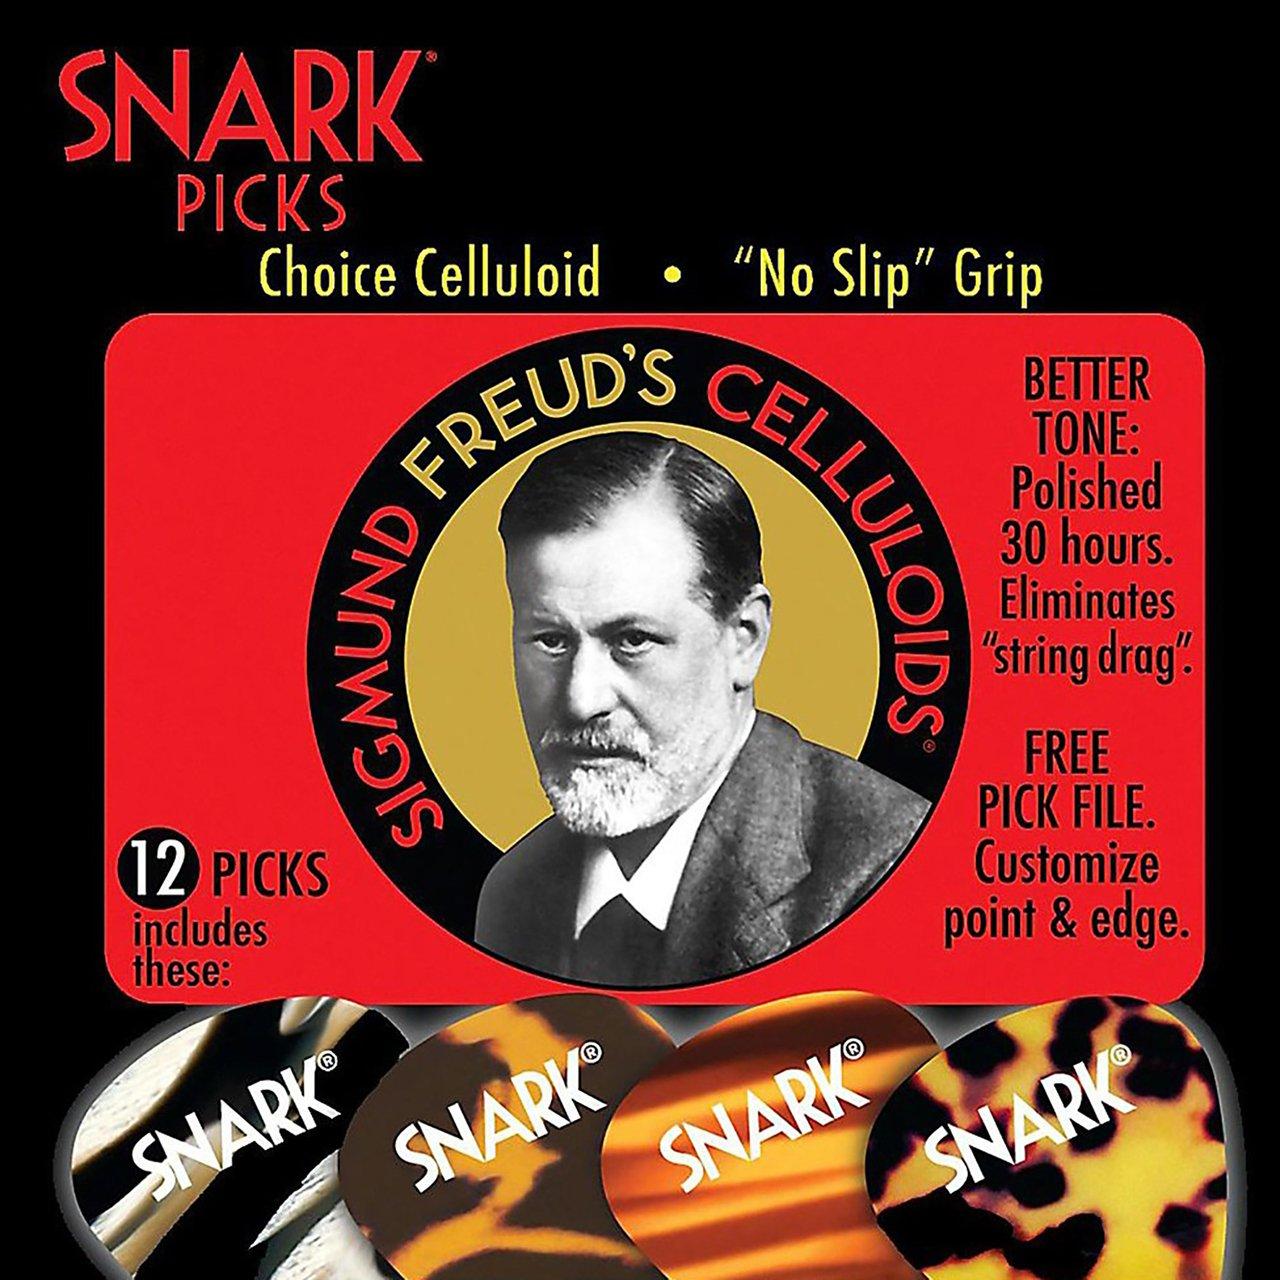 Snark Picks Choice Celluloid - Thin .5mm